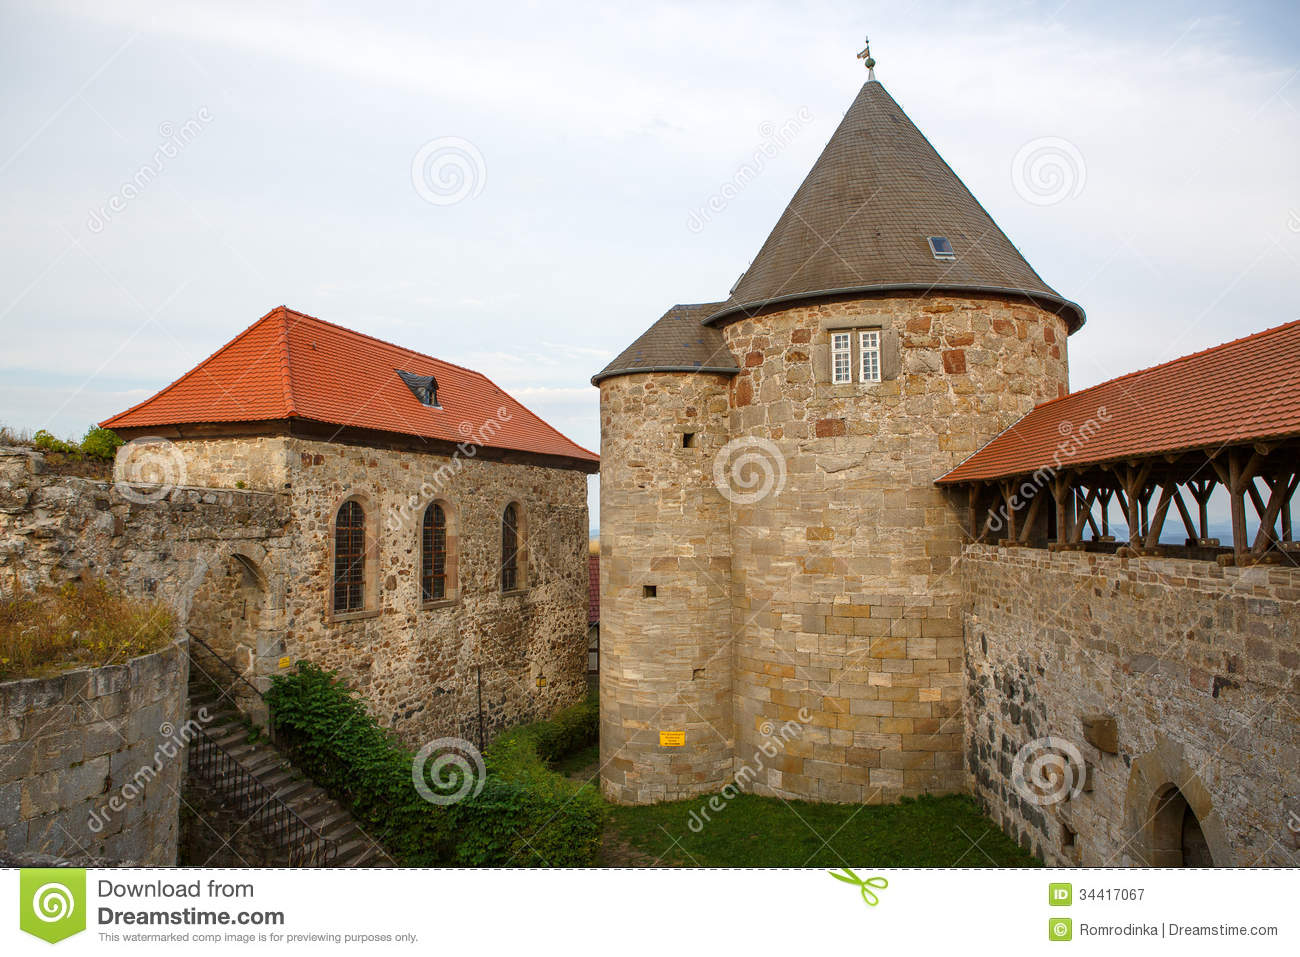 Castle Burg Herzberg, Germany, Hessen. Royalty Free Stock Images.